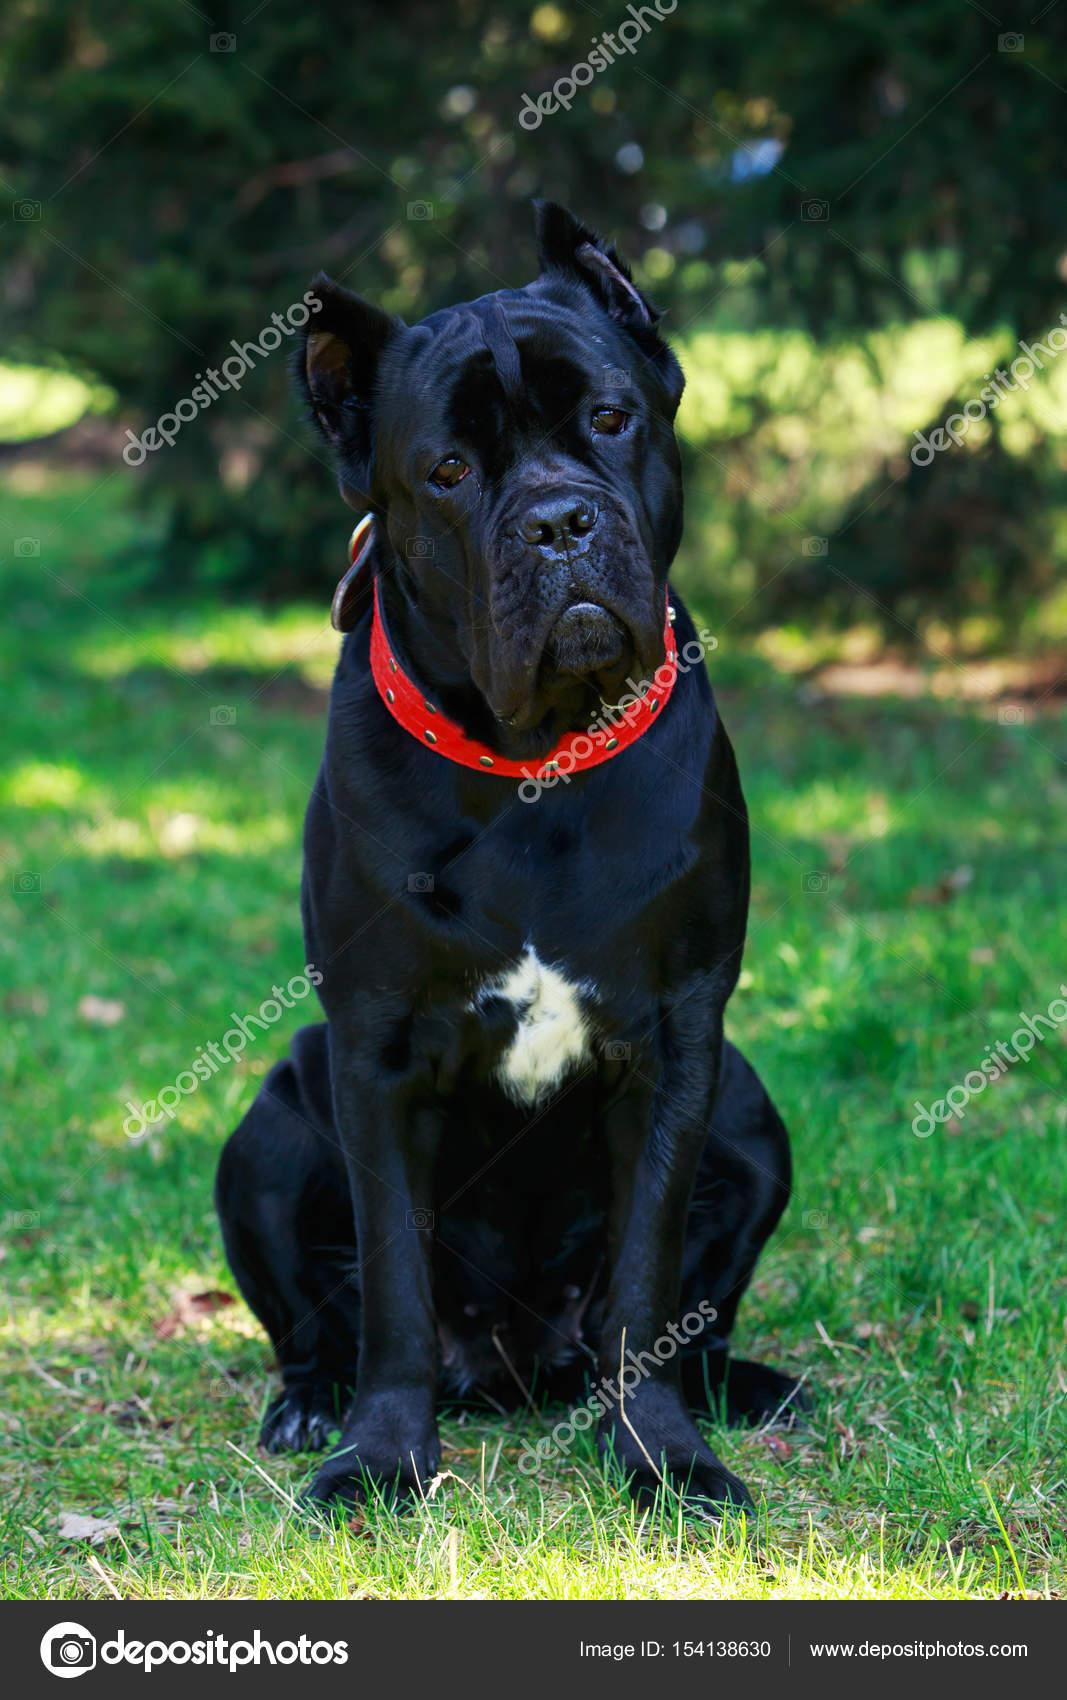 Dog Breed Cane Corso Italiano стоковое фото Deviddo 154138630